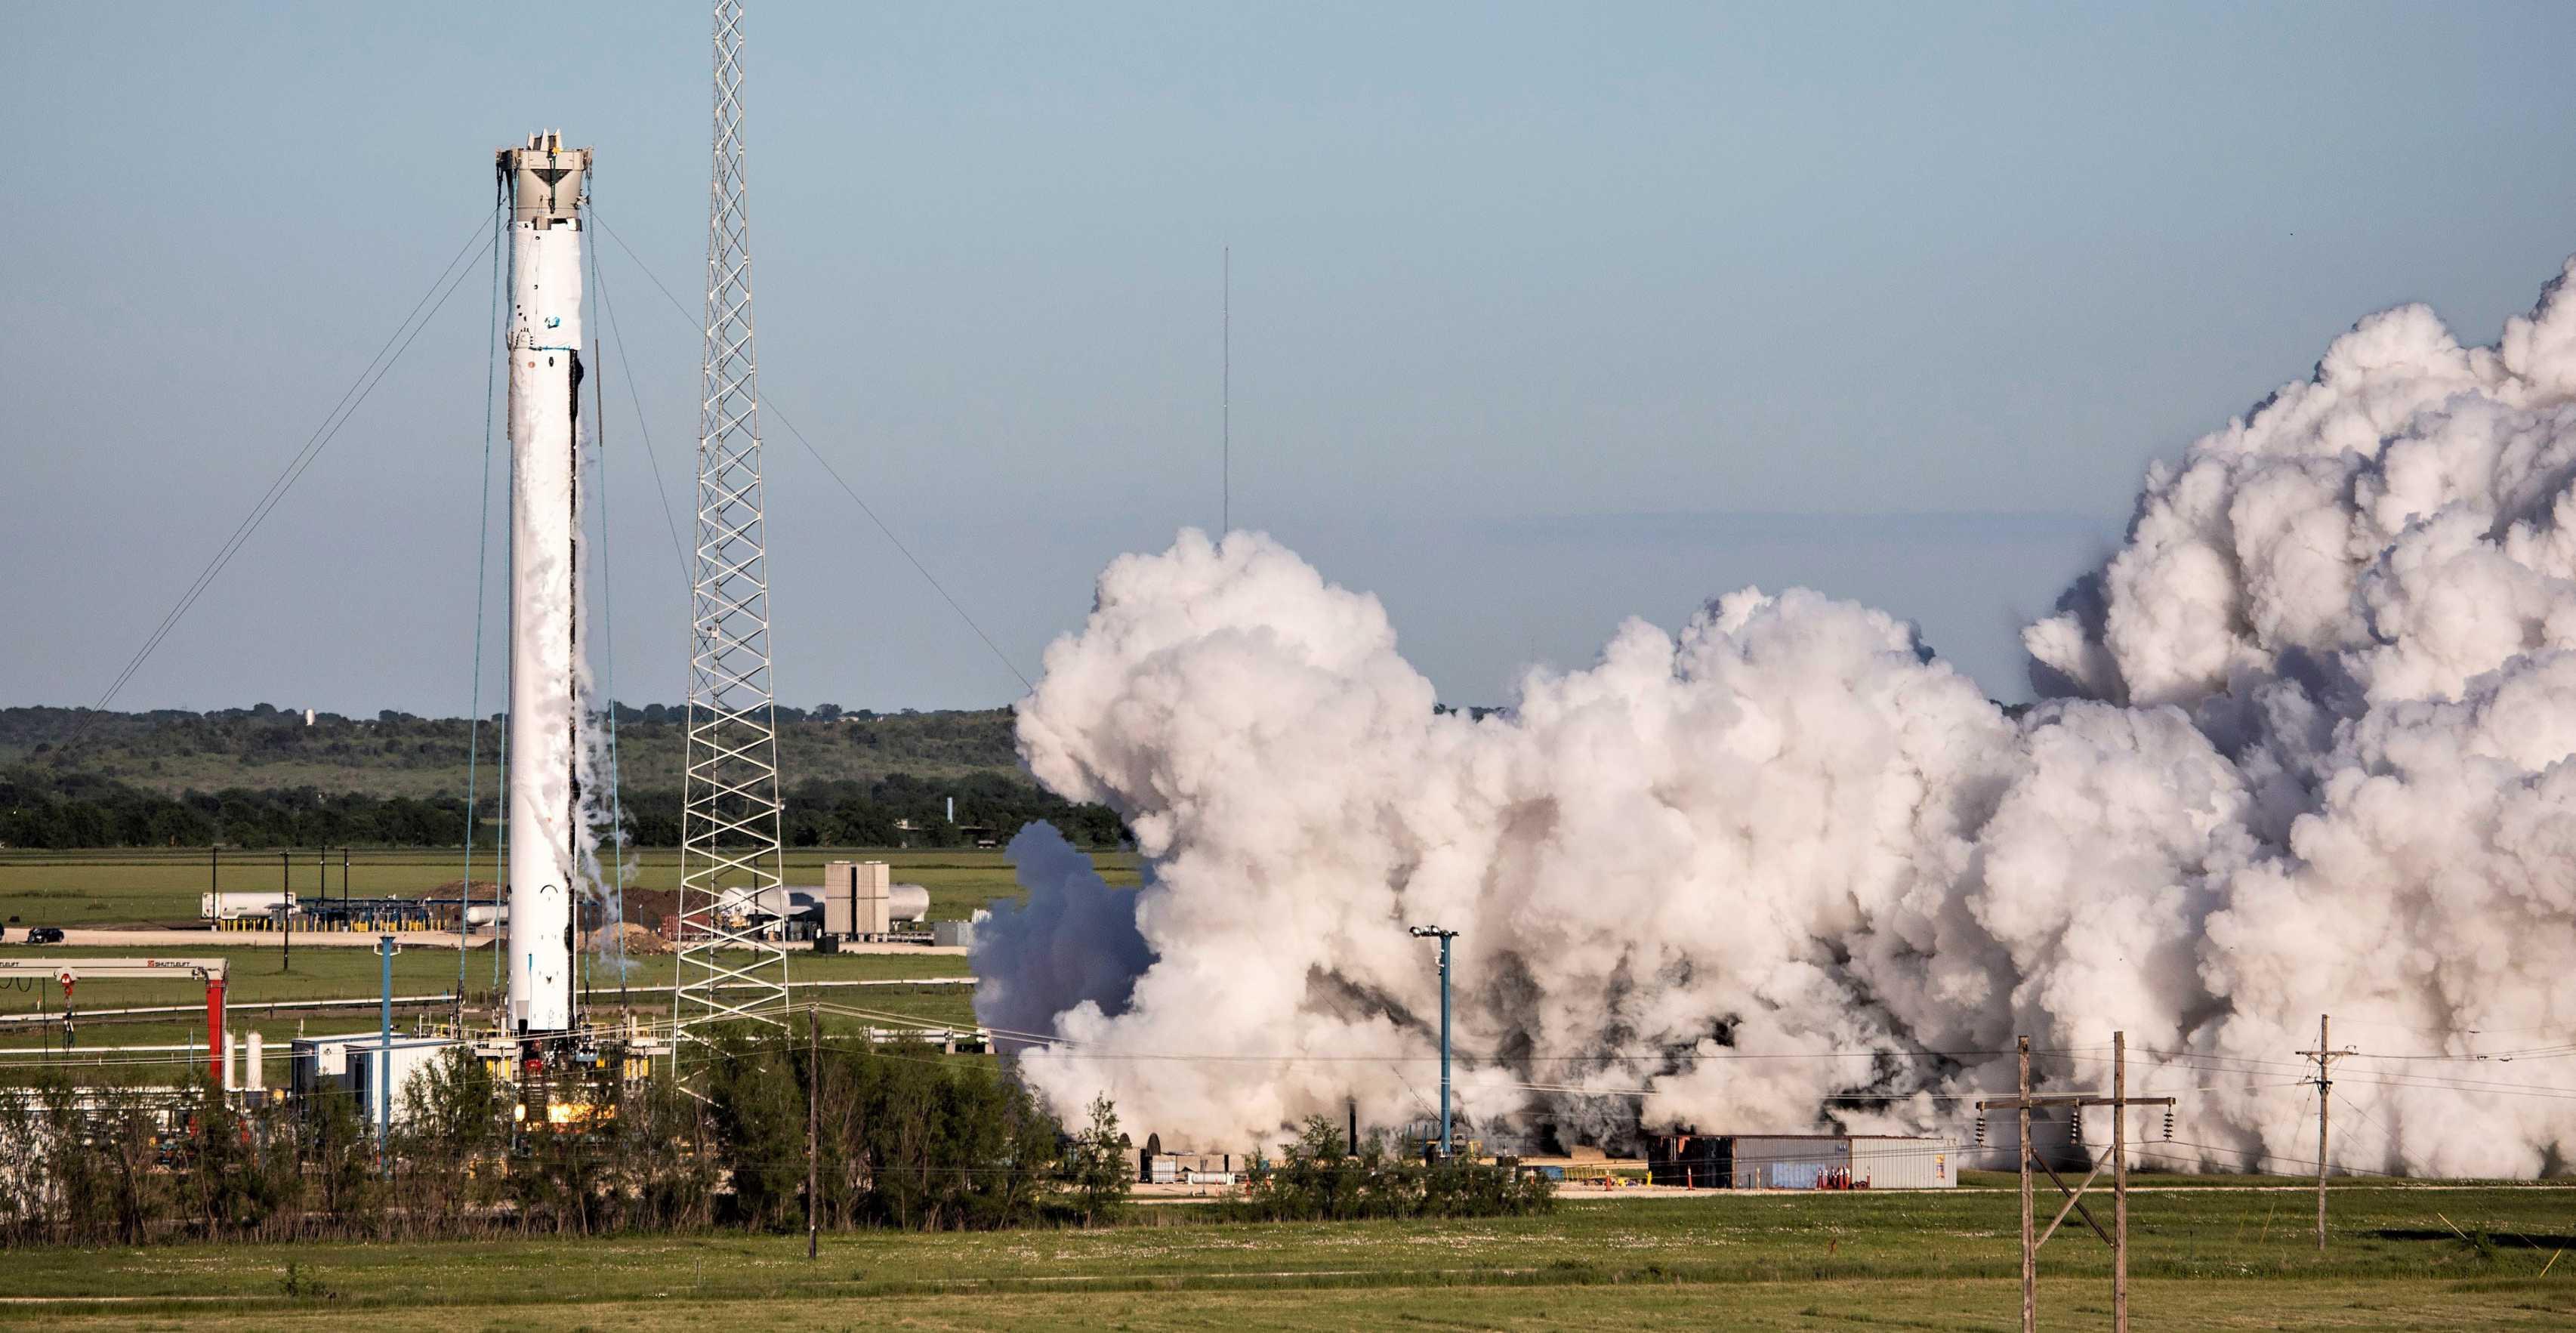 Falcon Heavy center core B1057 static fire test McGregor 042619 (SpaceX) 1 edit (c)